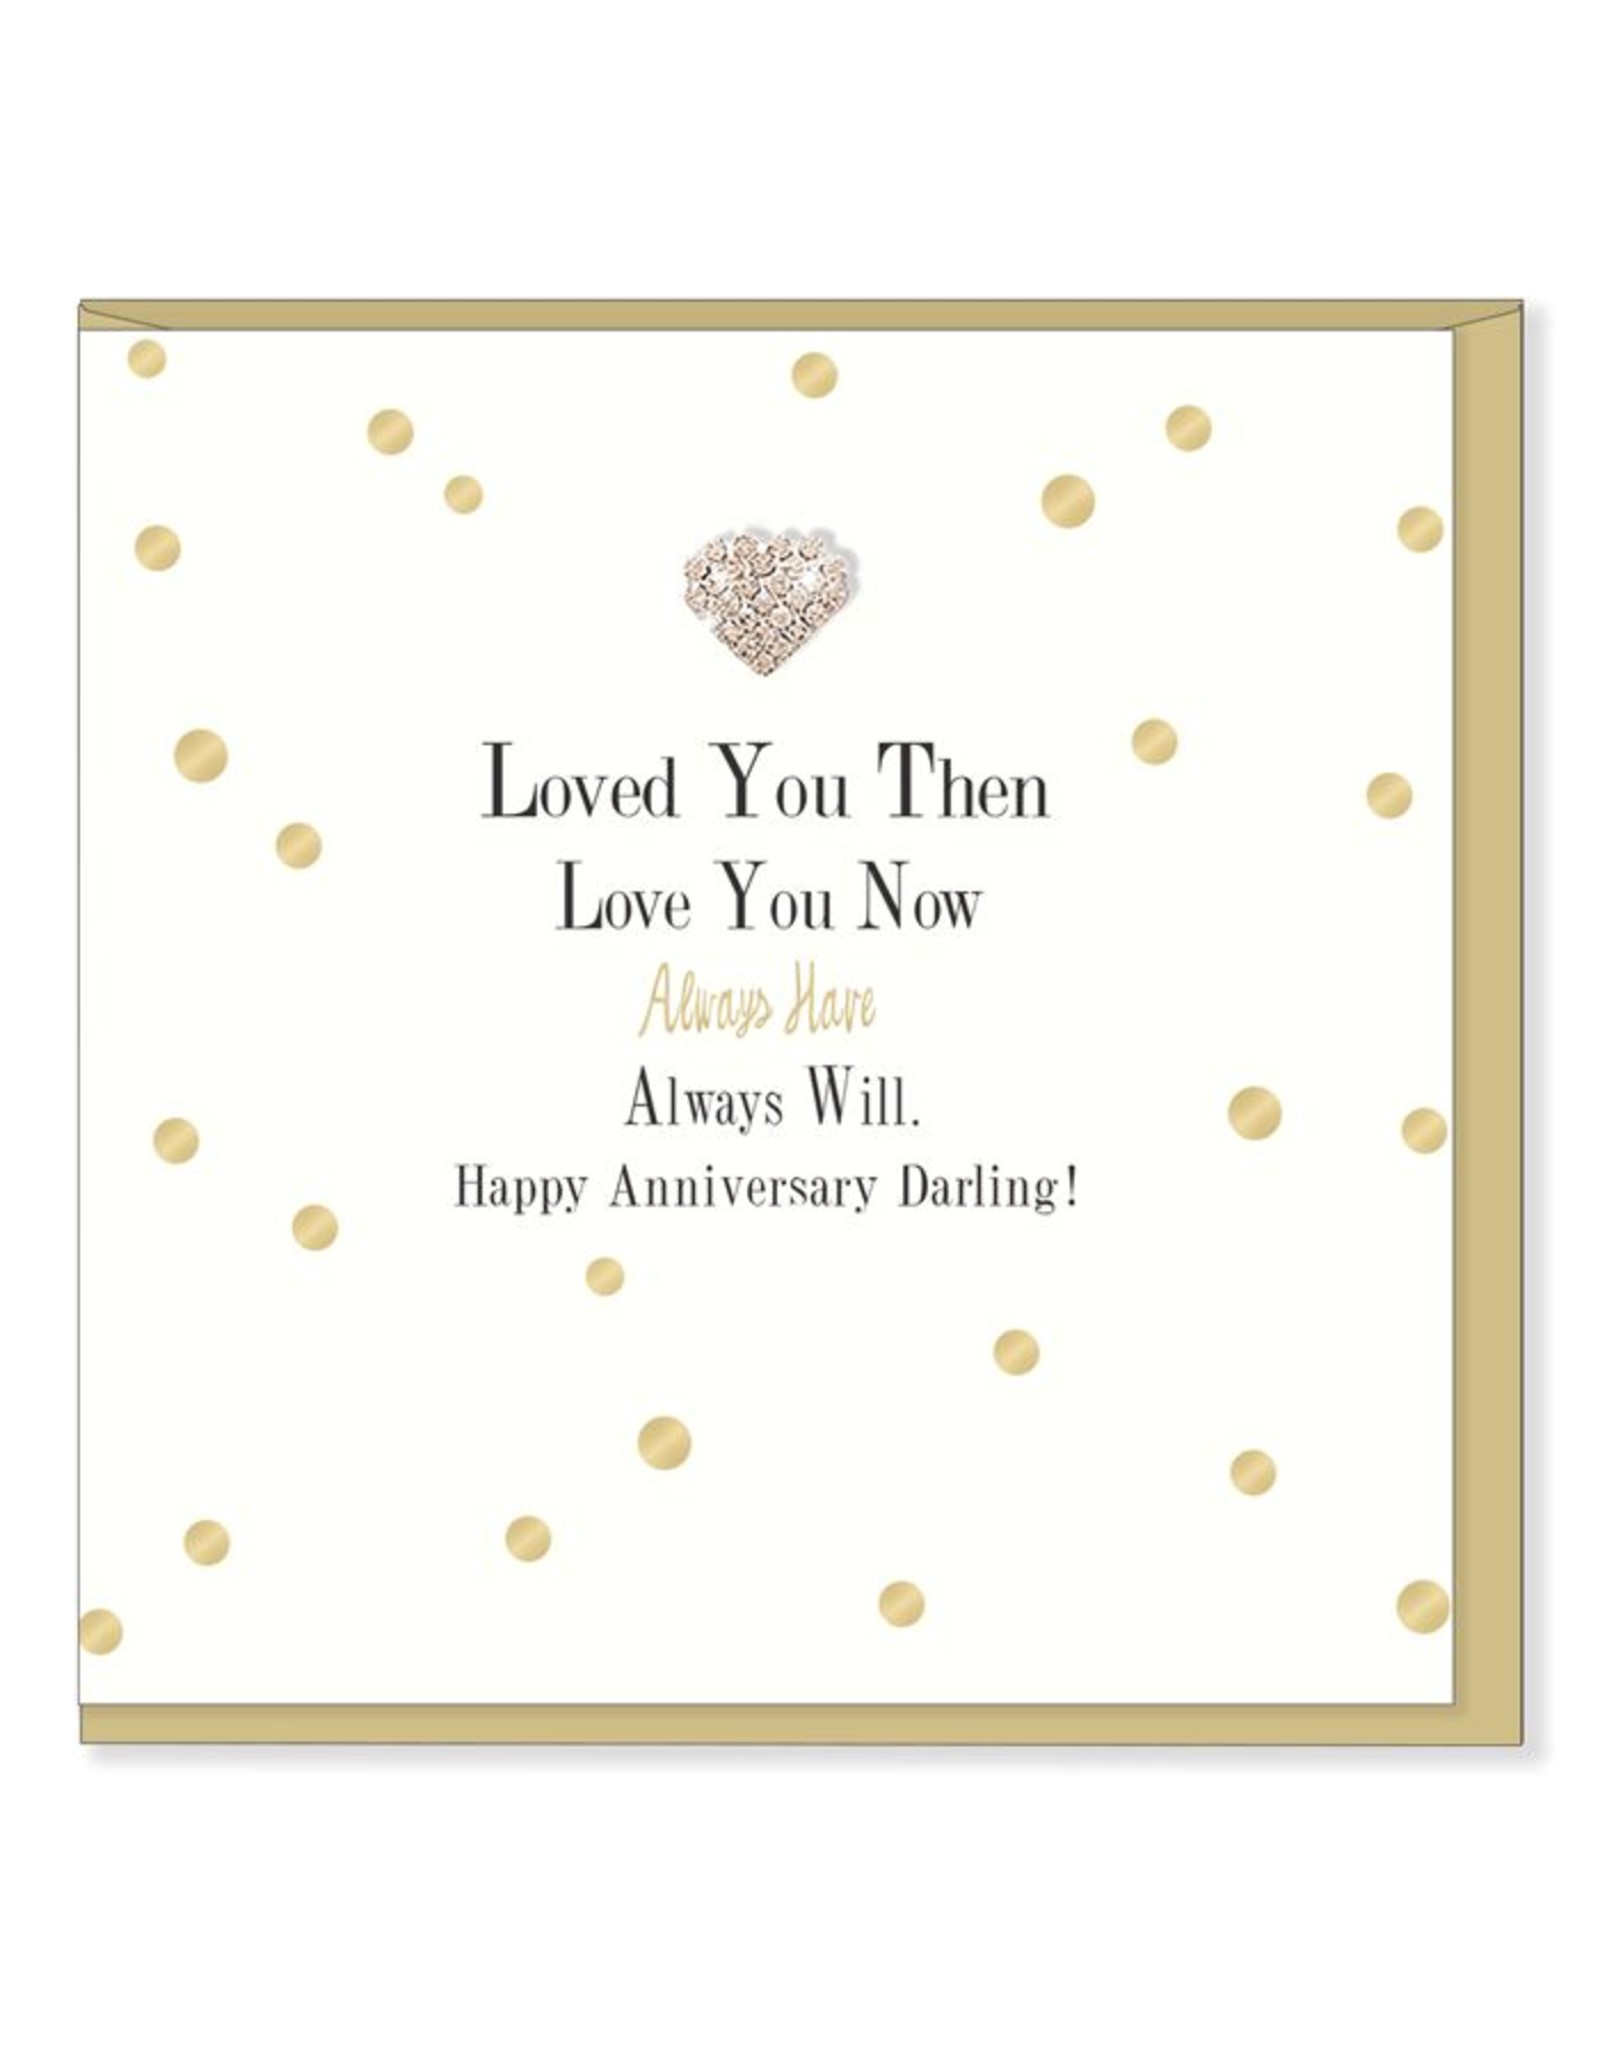 Hearts Design Wenskaart - Happy Anniversary Darling